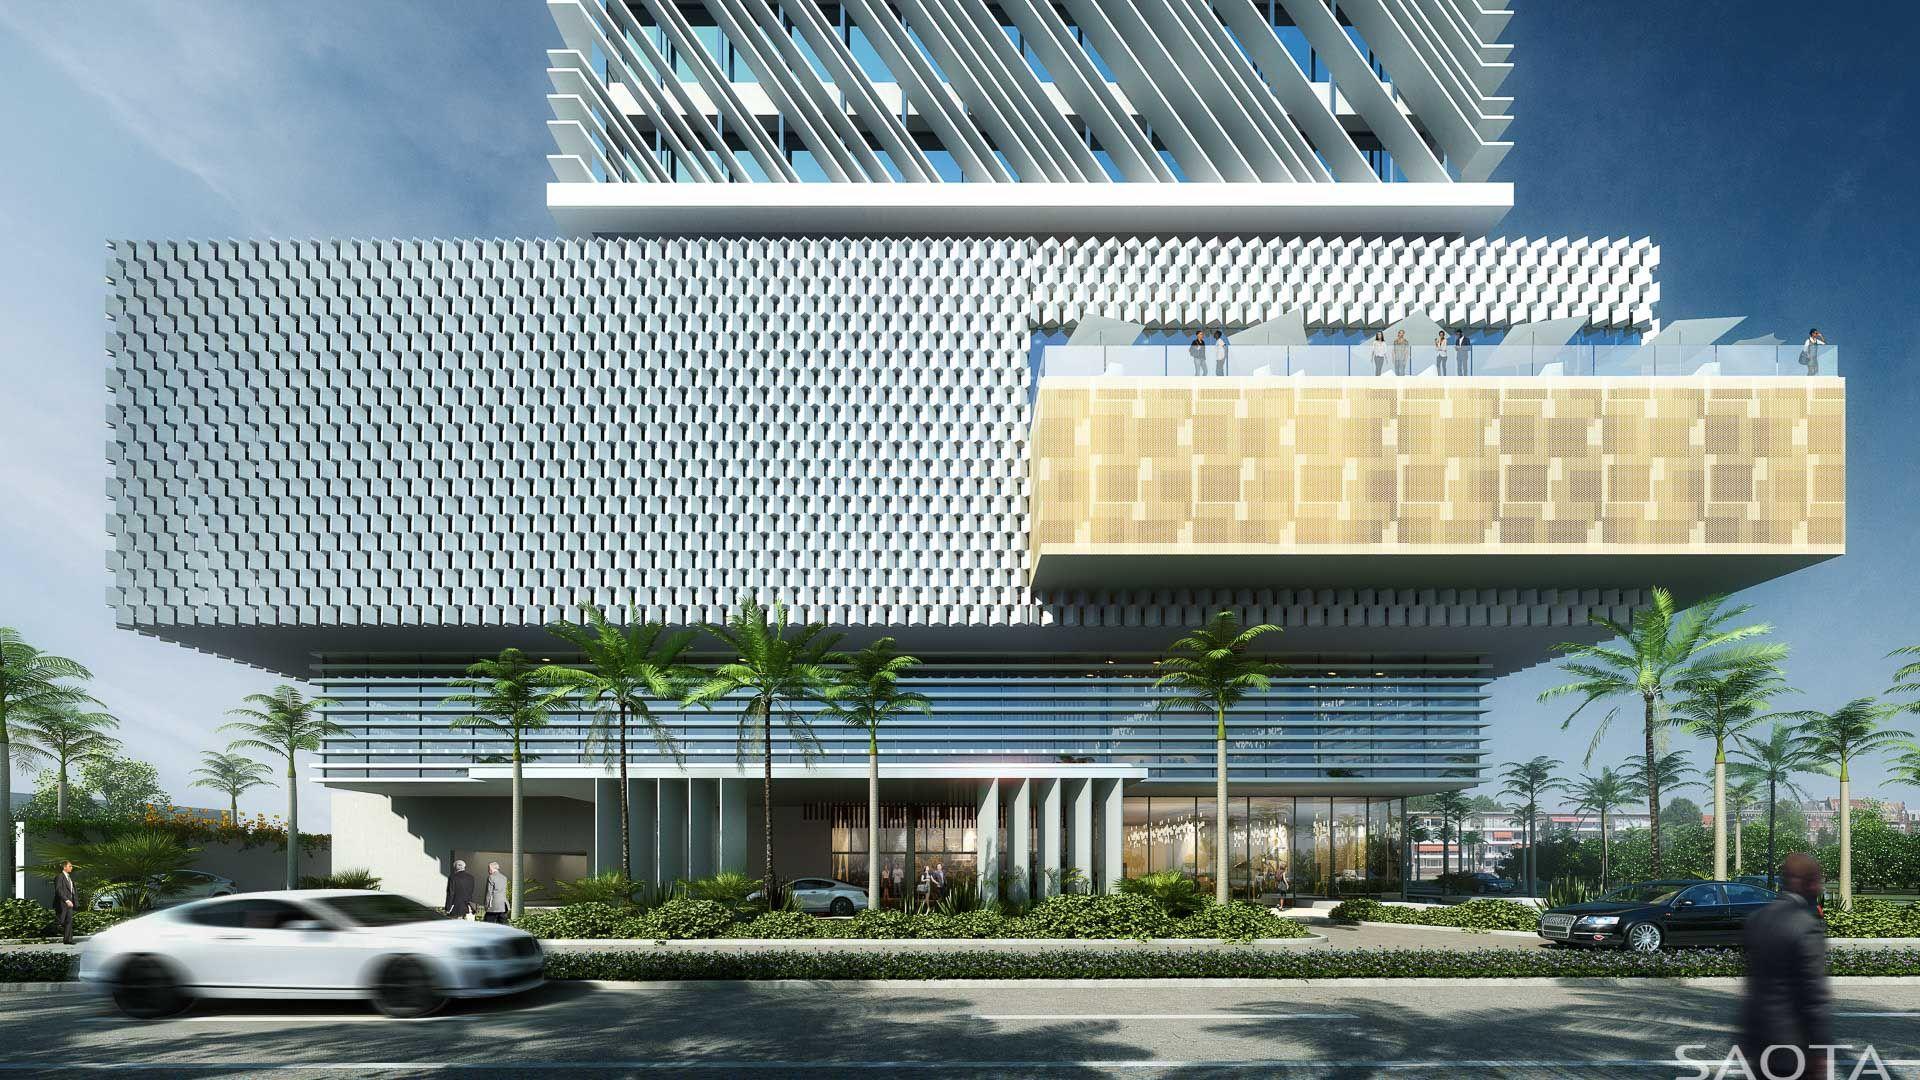 CI JARDIN HOTEL - SAOTA Architecture and Design